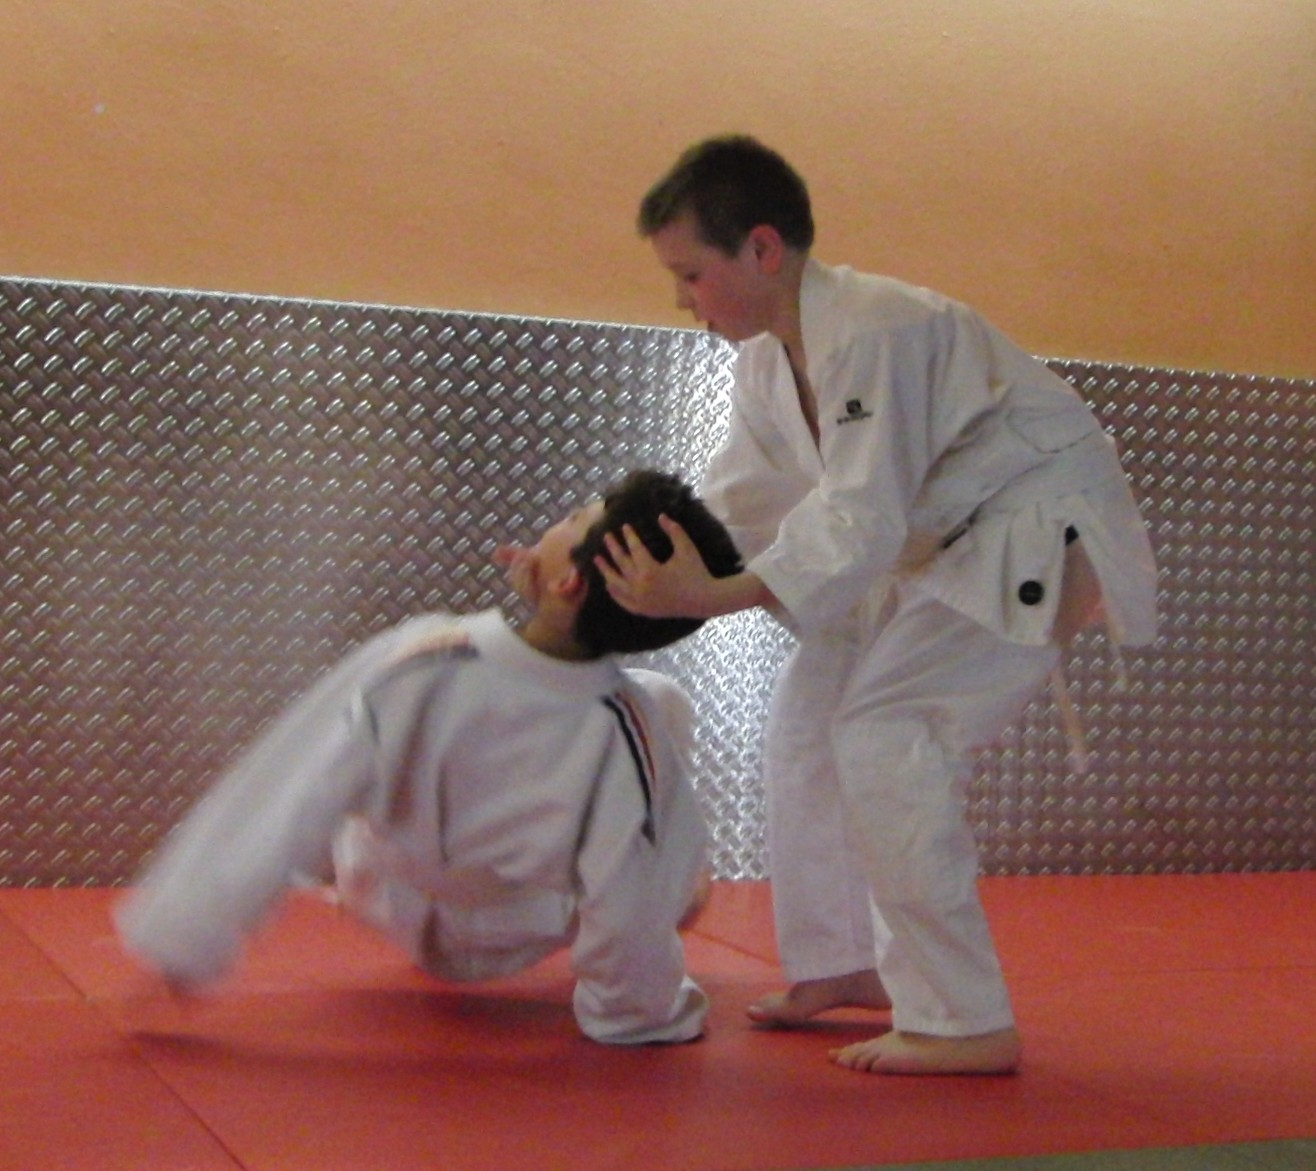 Zen-Ki-Budo - Jiu-Jitsu und moderne Selbstverteidigung - Bochum - Herne - Wanne-Eickel